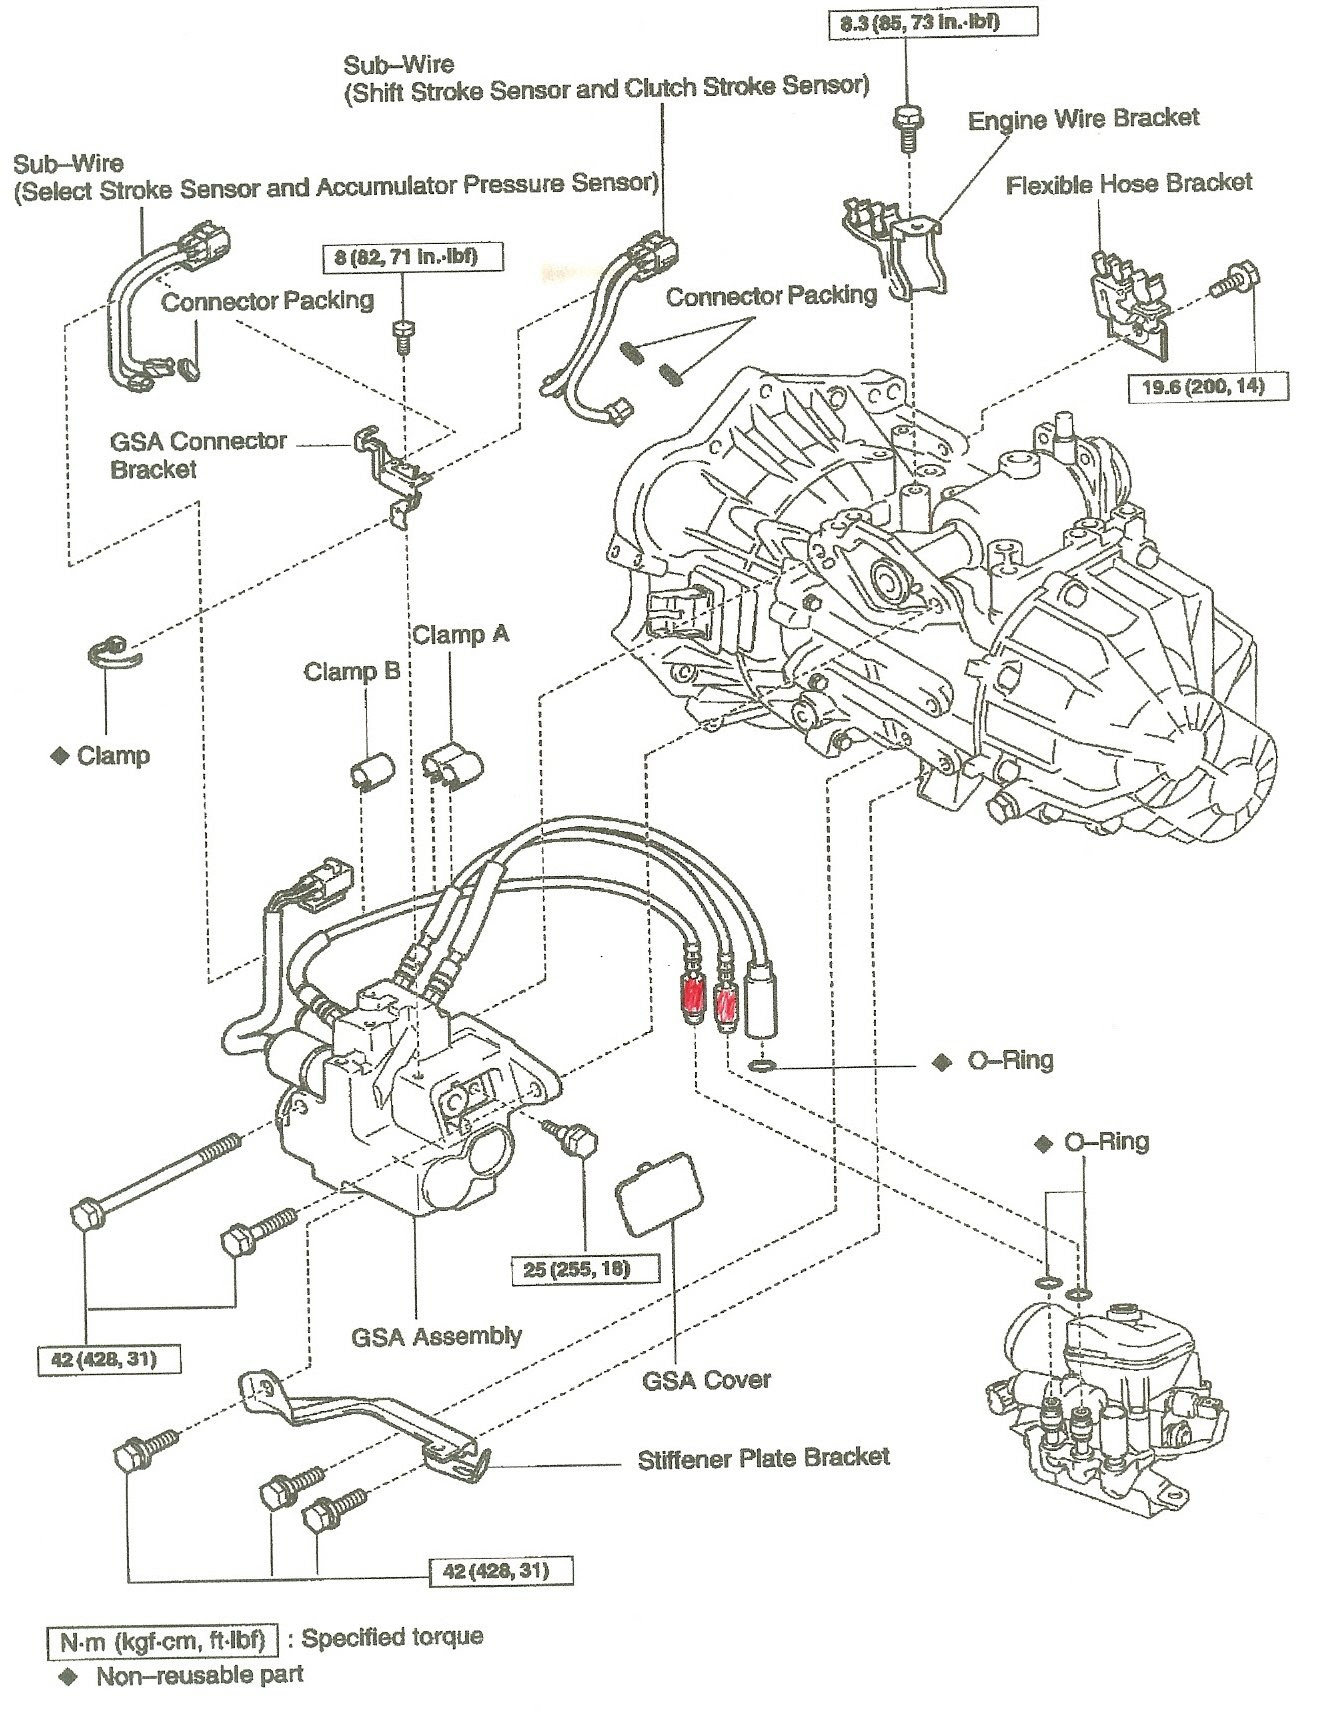 Diagram Toyota Mr2 Wiring Diagram Full Version Hd Quality Wiring Diagram Diagramamedia Tattica Digitale It